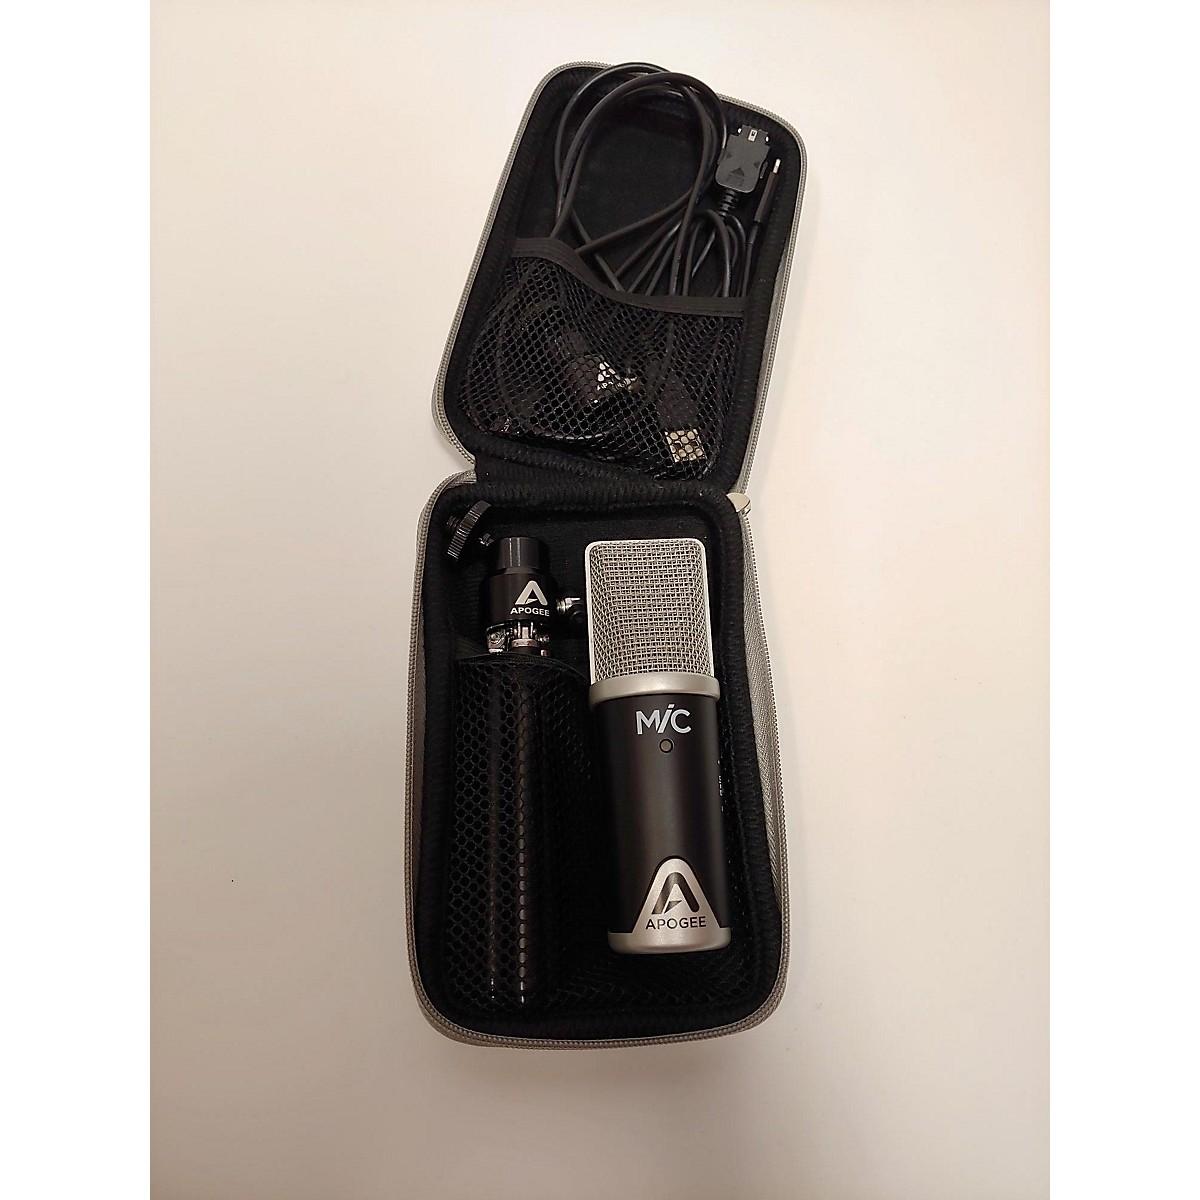 Apogee MiC 96k Lightning USB Microphone